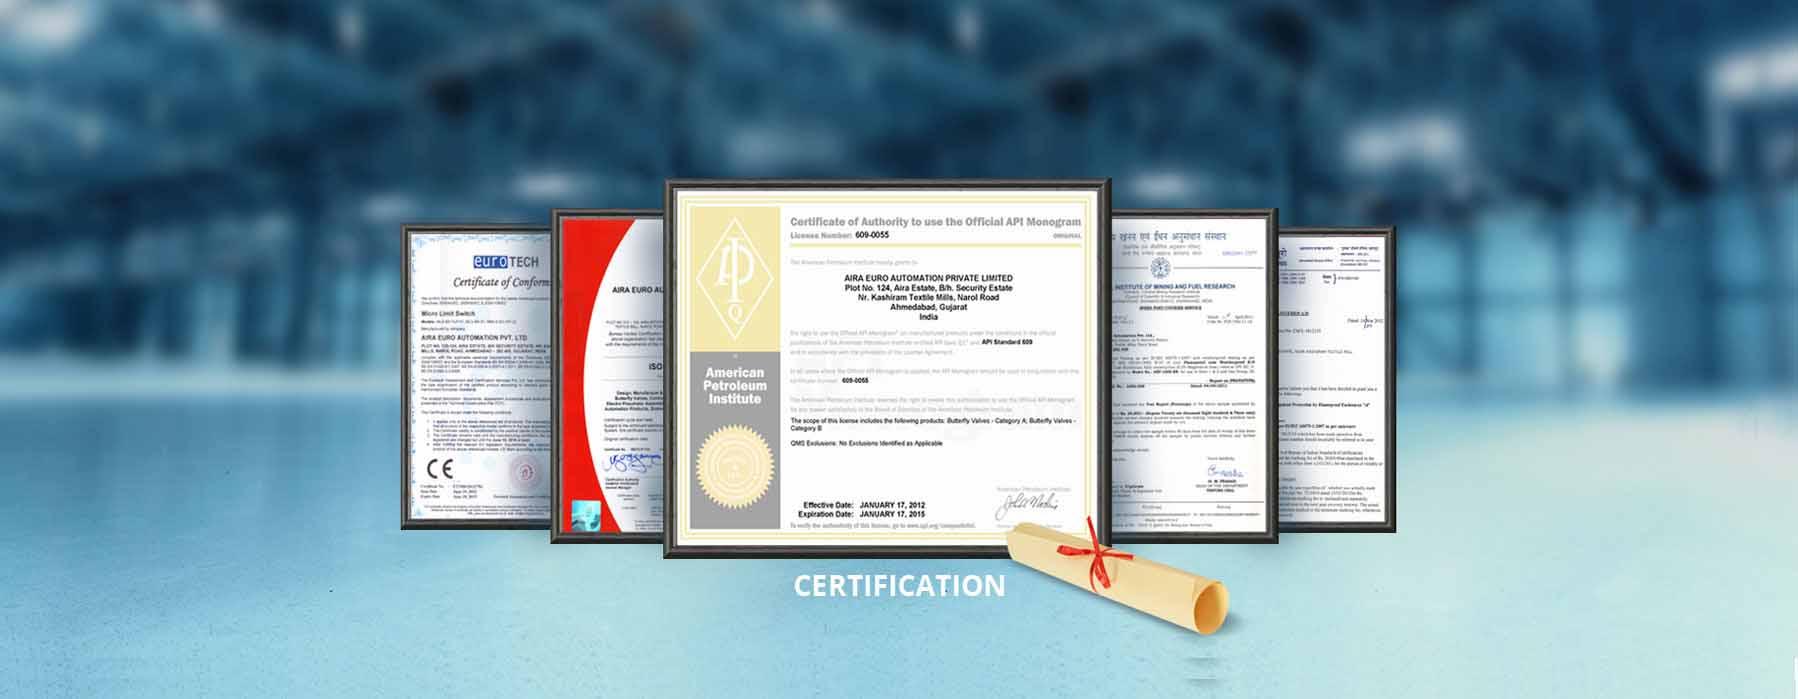 Aira's Certification